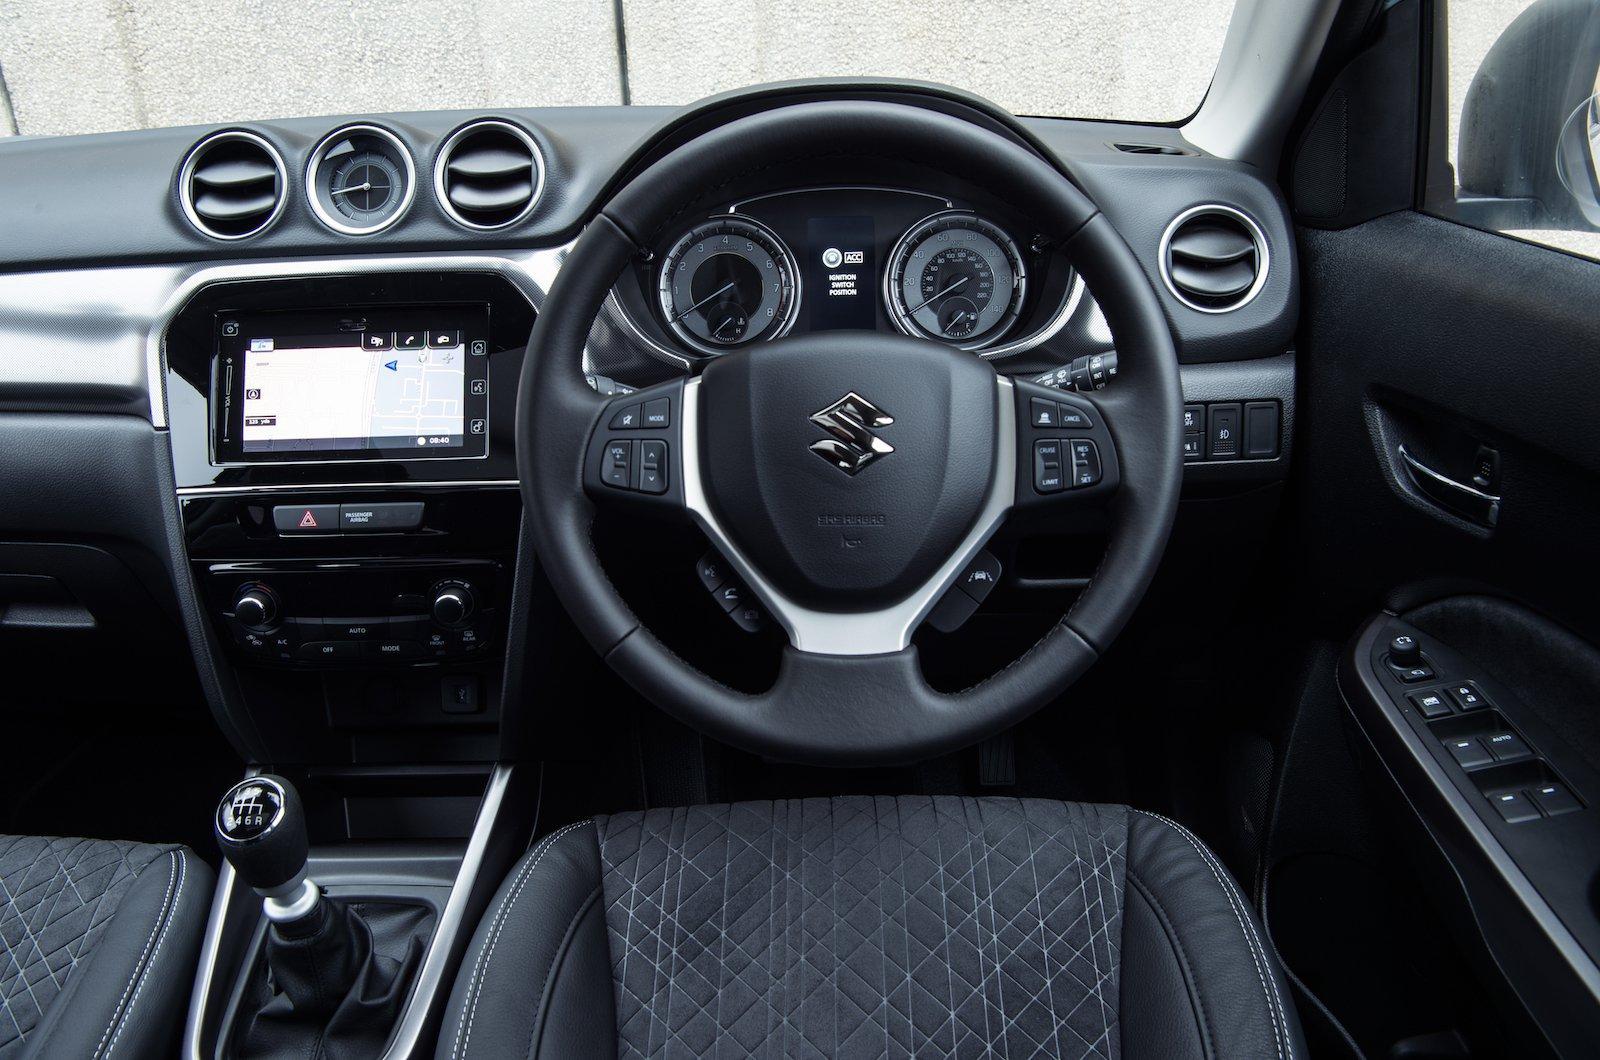 Suzuki Vitara 1.0 Boosterjet SZ4 - interior